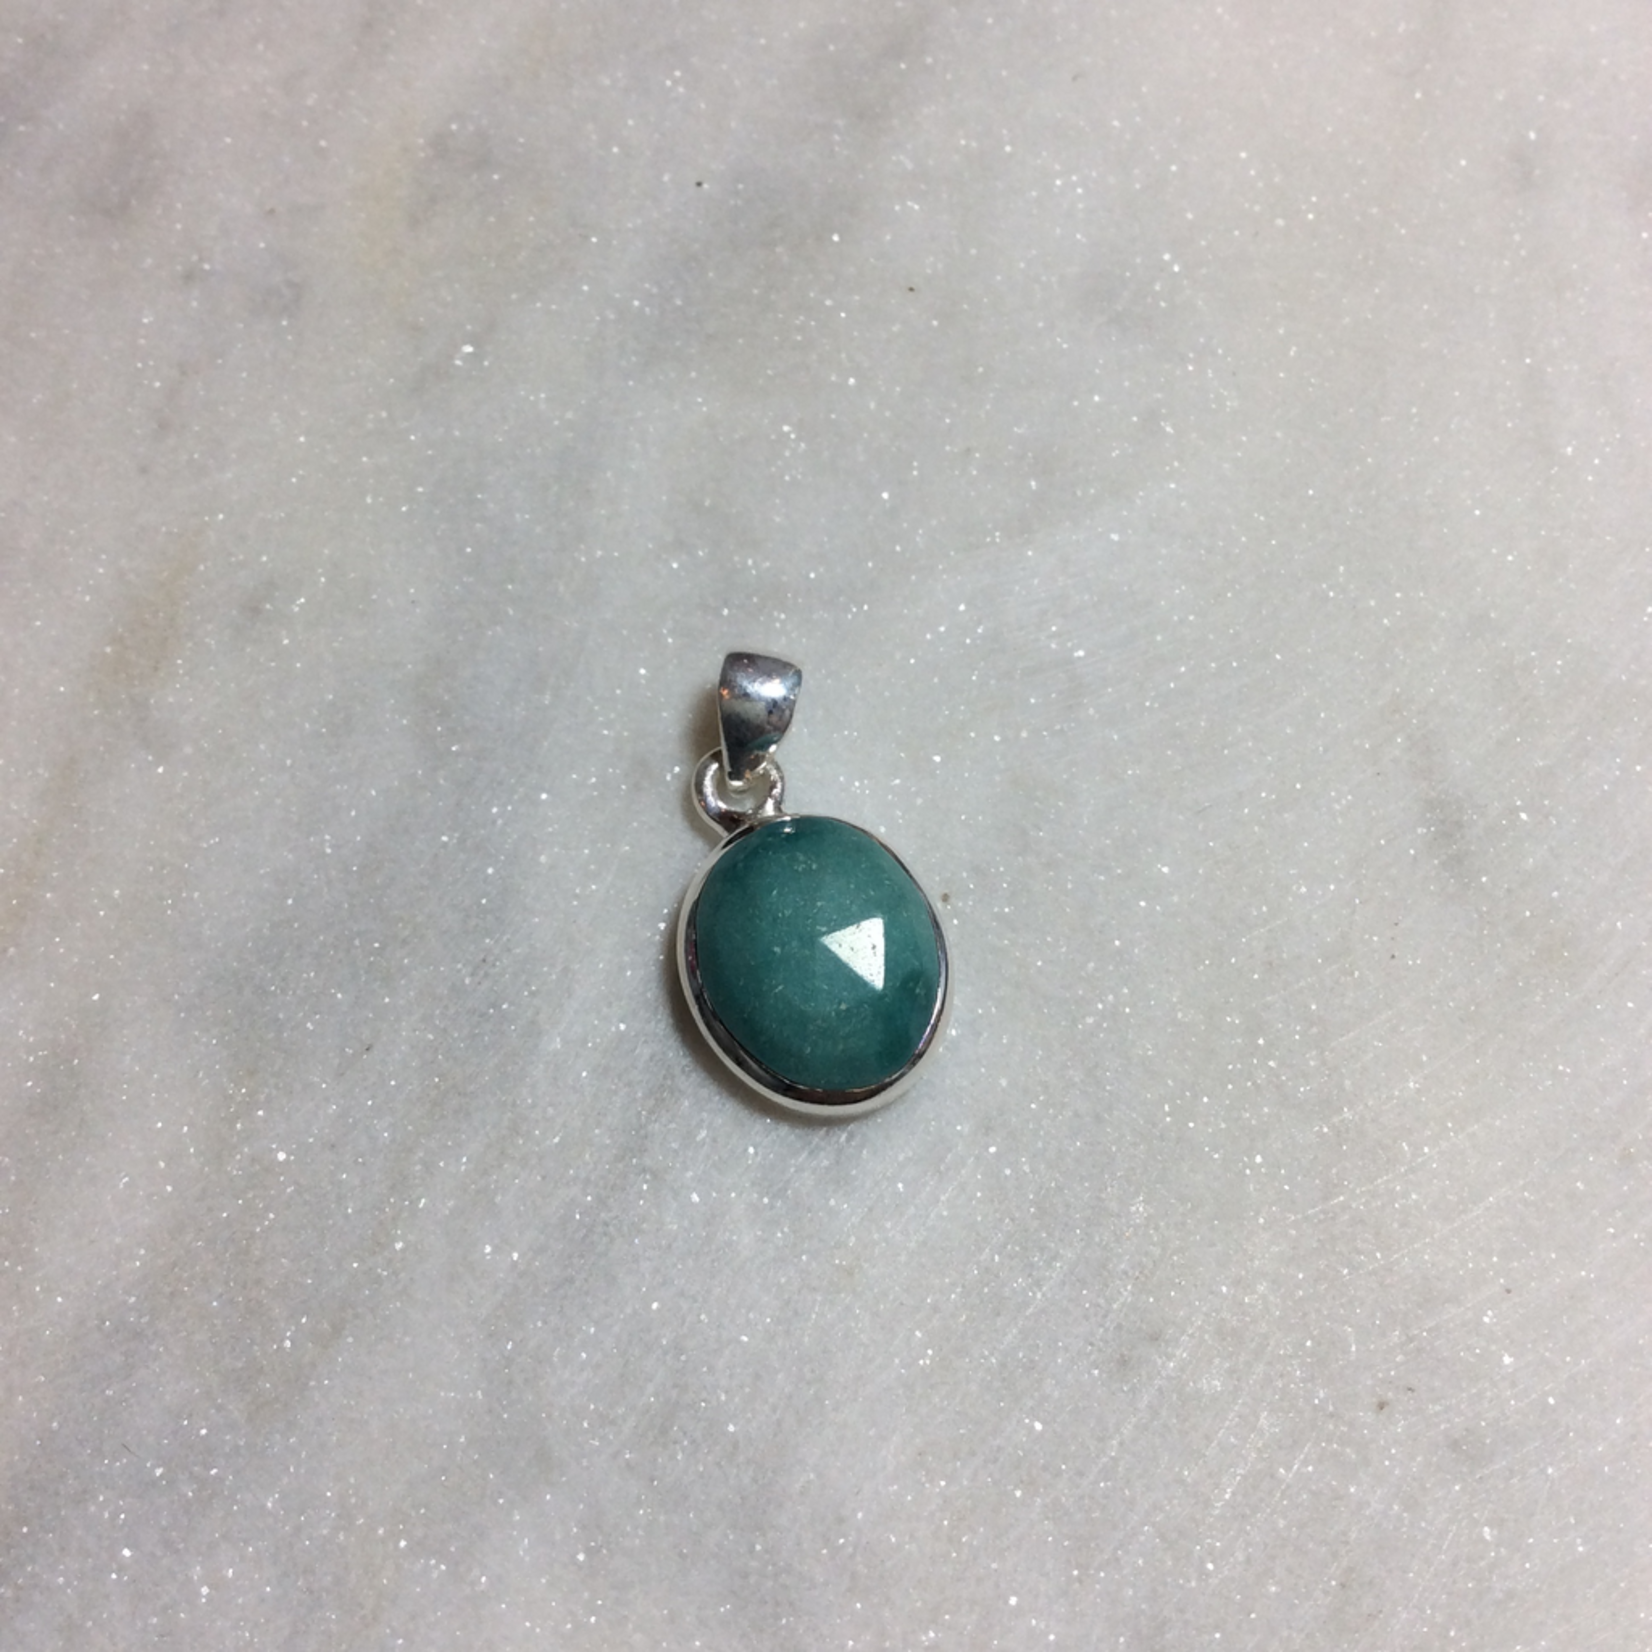 Silvex Images Extra Small Aqua Stone Oval Pendant